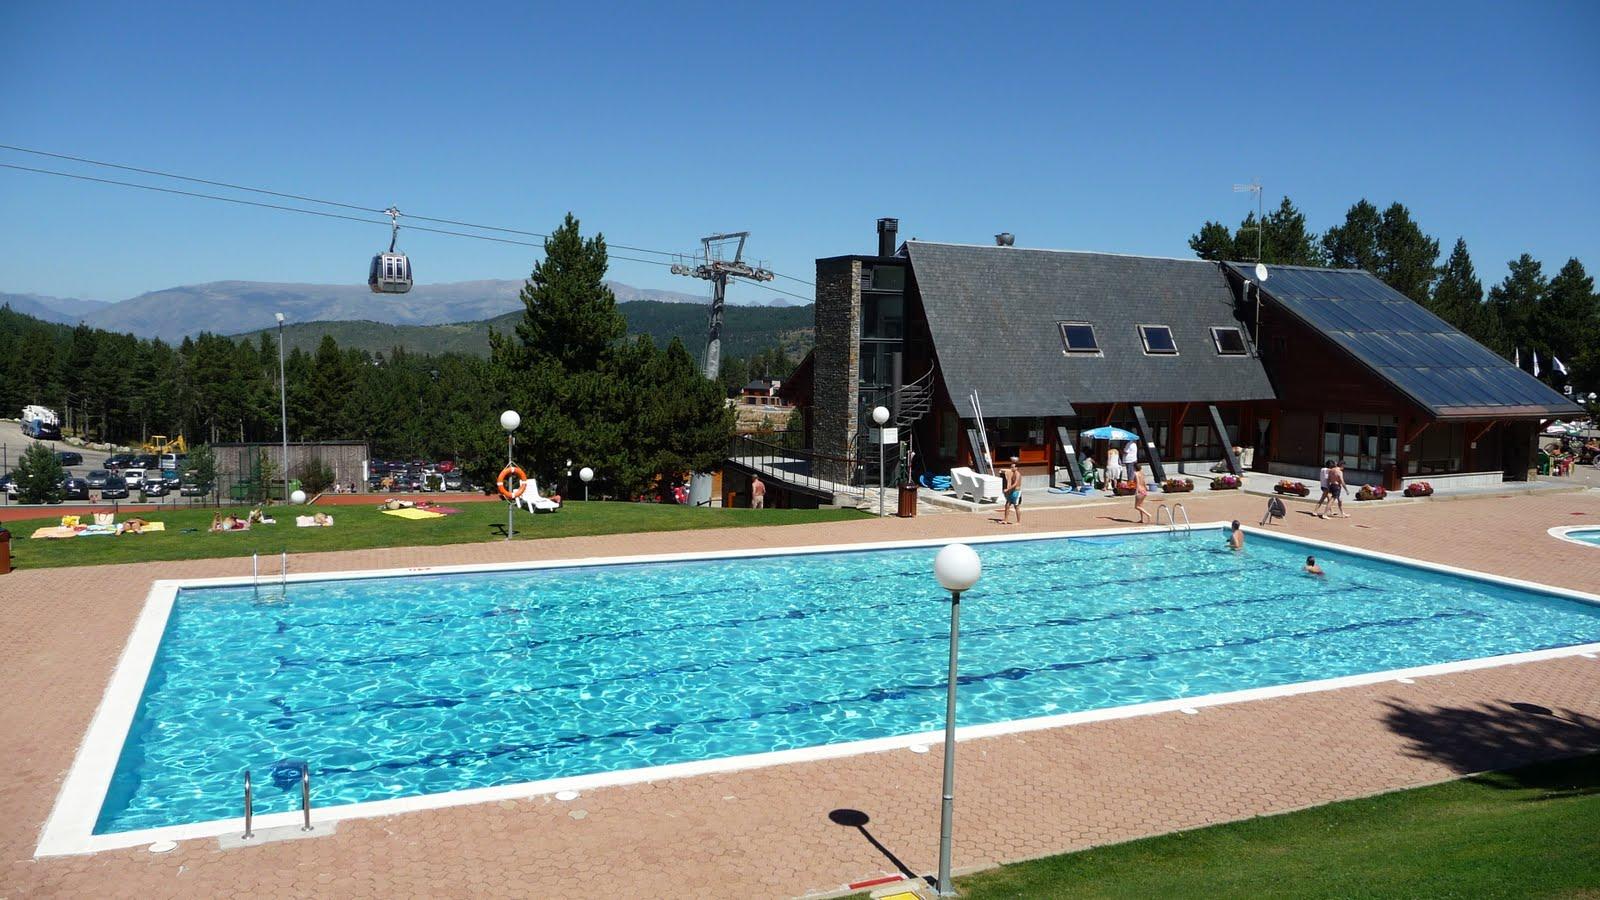 Hotel Andalo Con Piscina Esterna